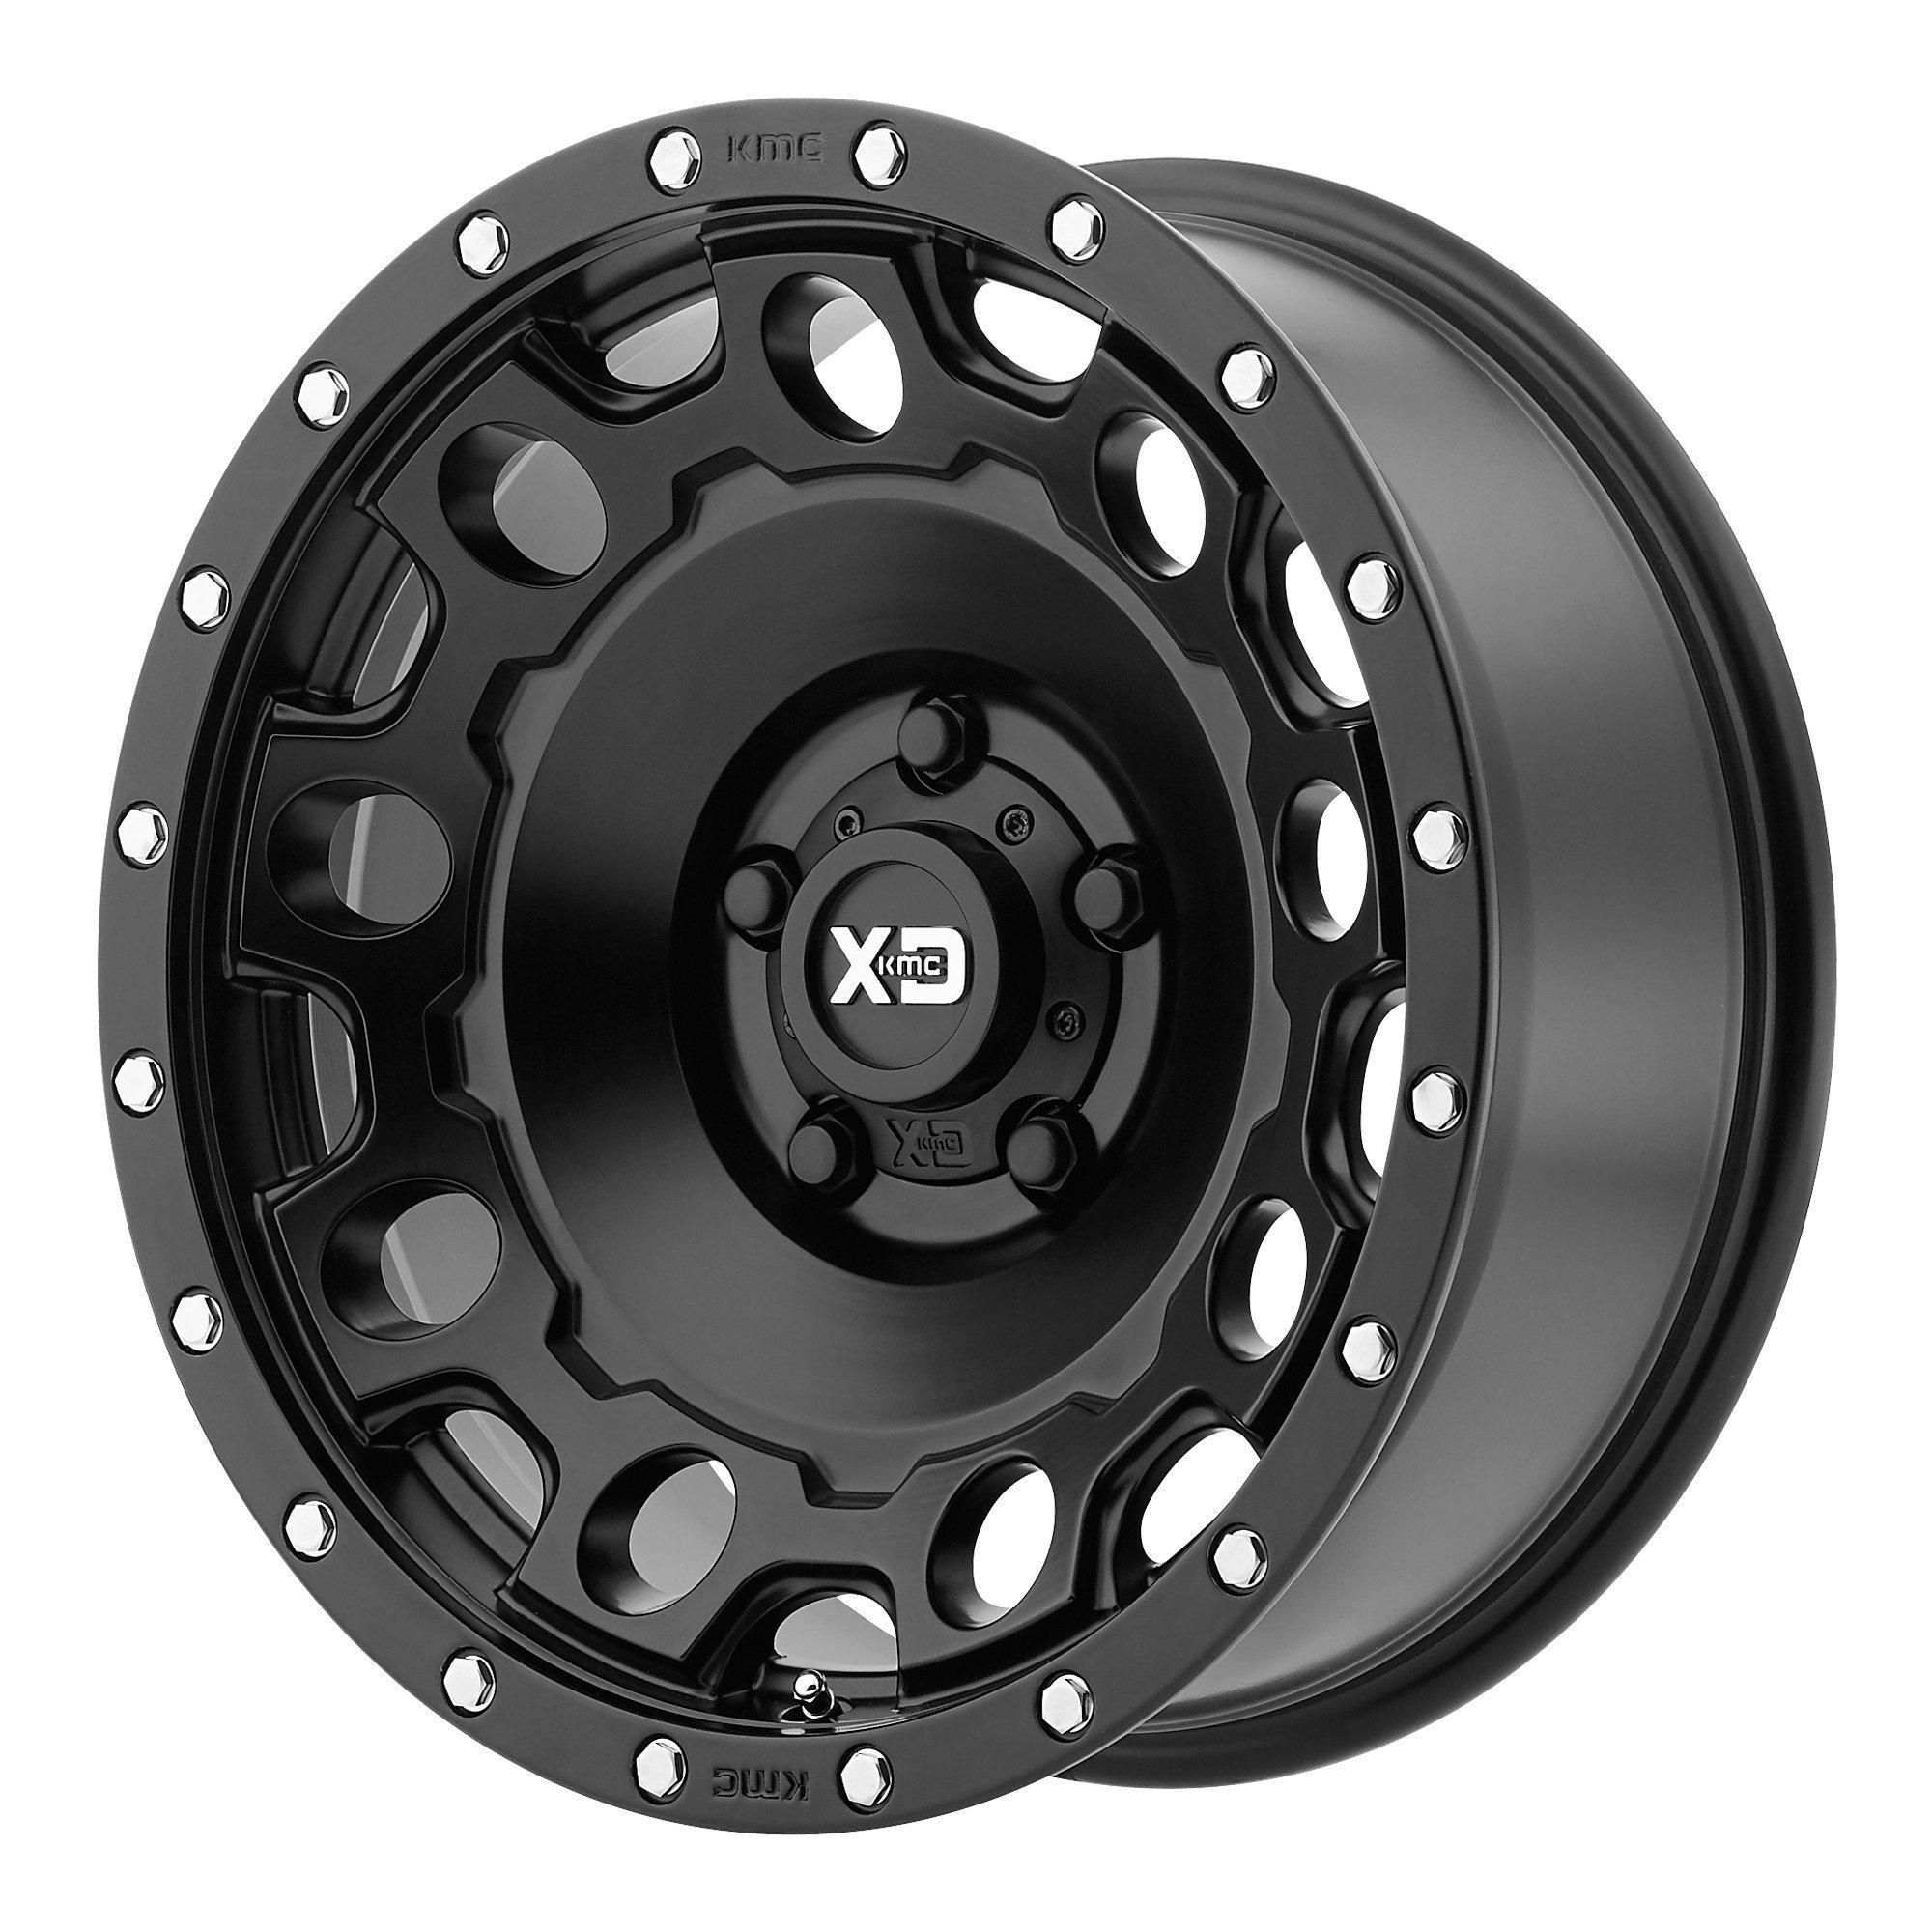 XD SERIES BY KMC WHEELS HOLESHOT SATIN BLACK HOLESHOT 18x9 6x139.70 SATIN BLACK (18 mm)